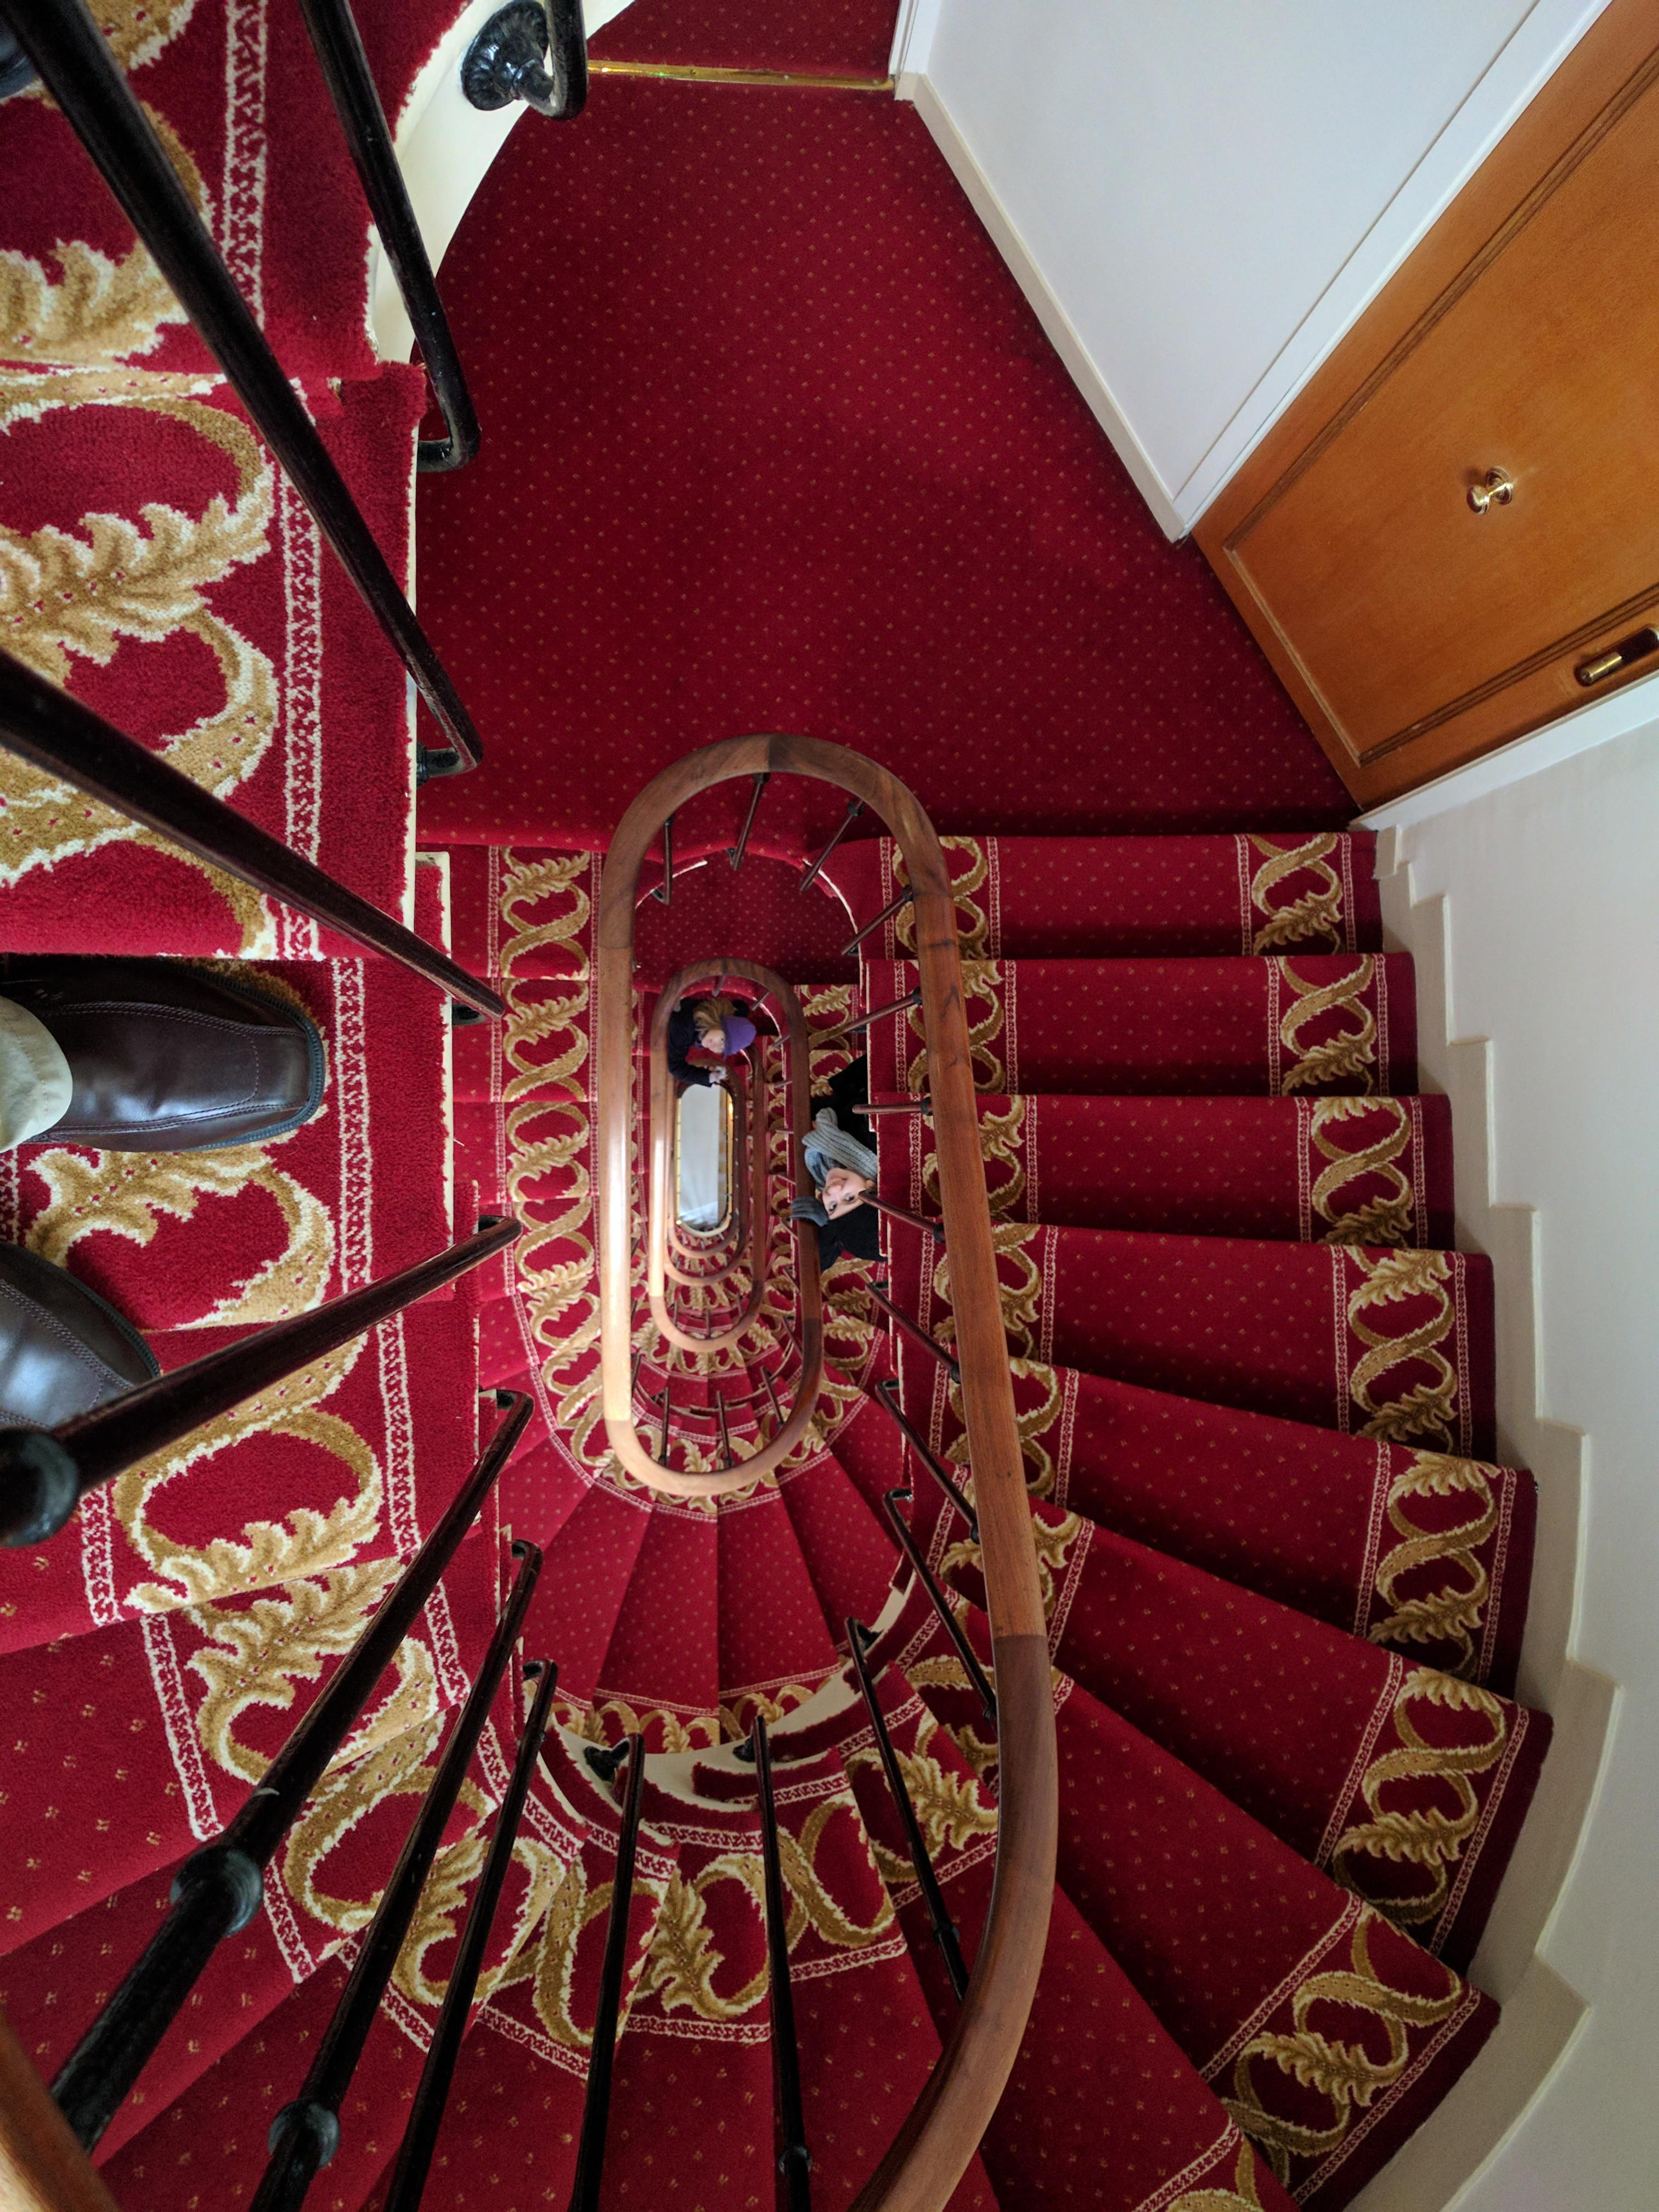 Stairway in hotel